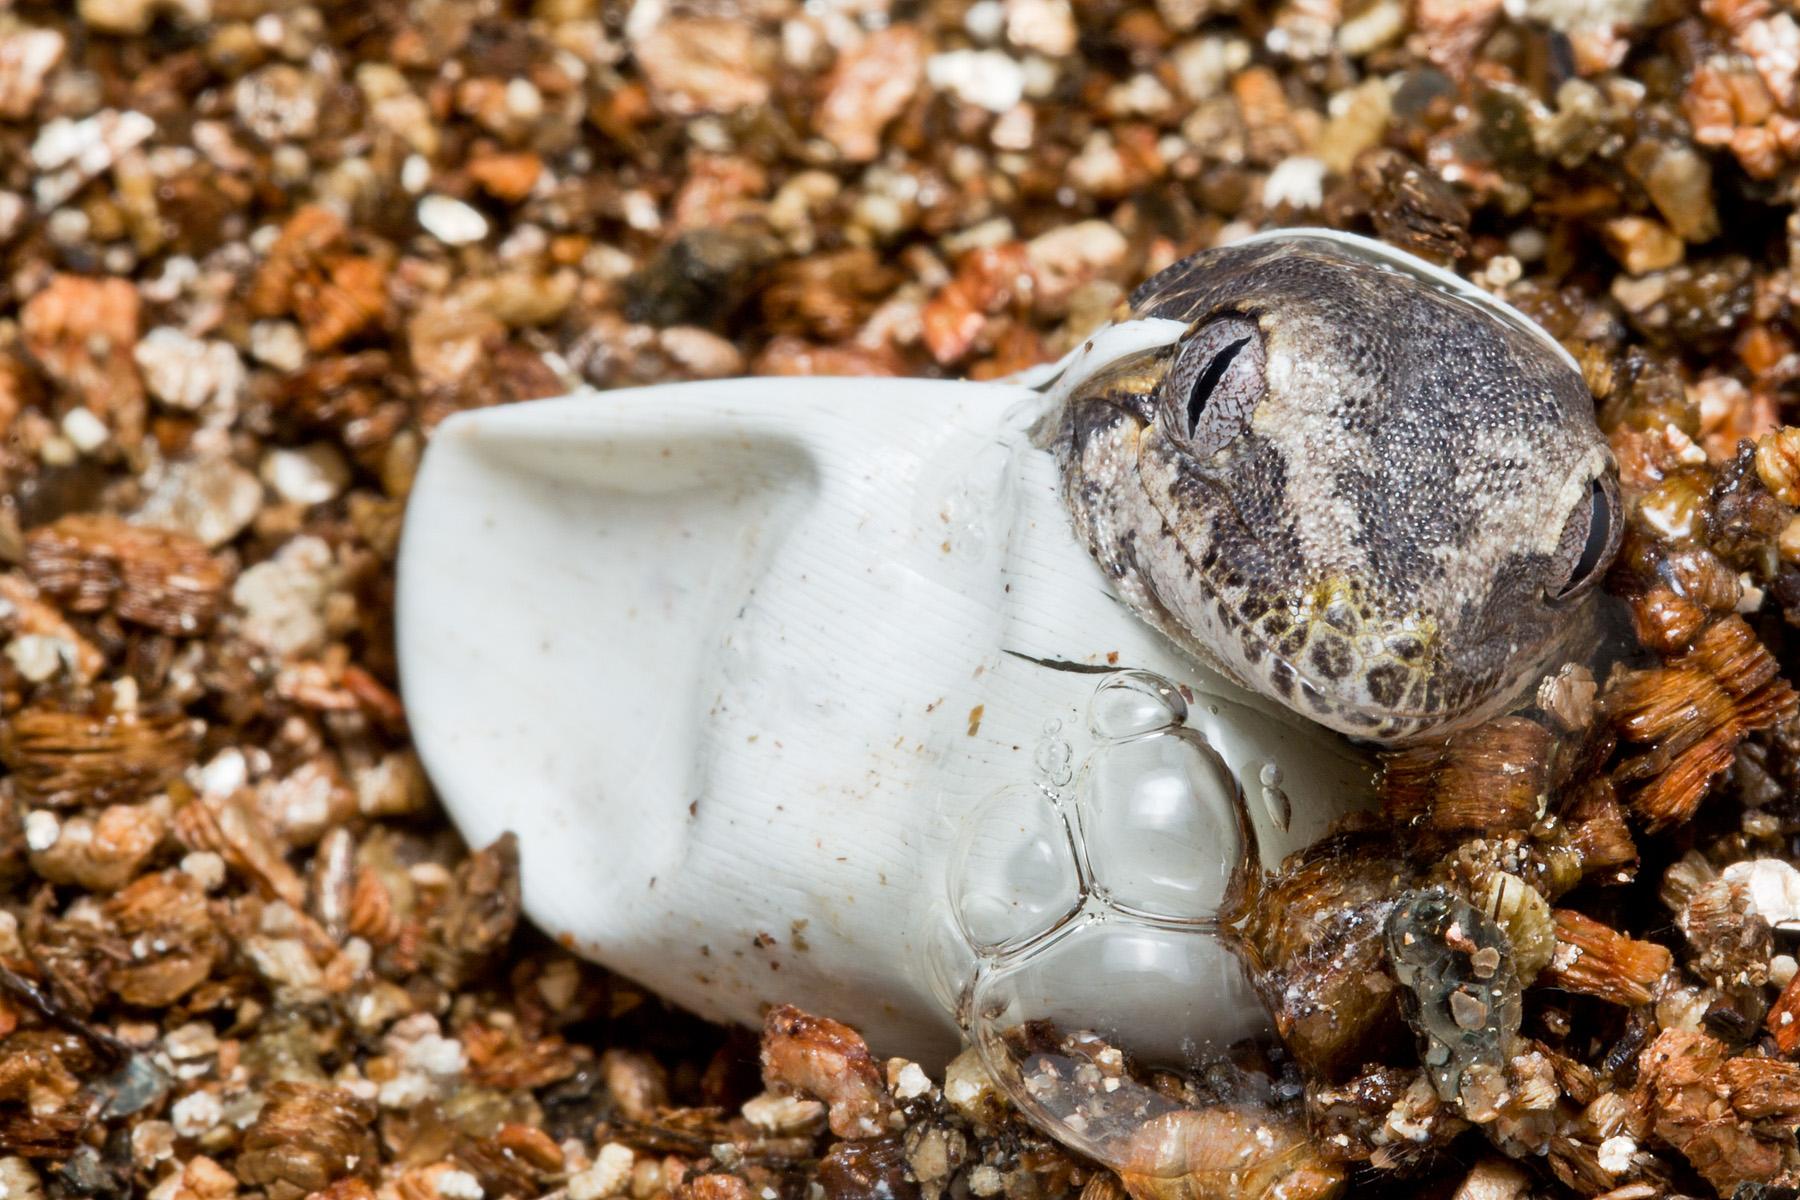 Rhacodactylus auriculatus hatching